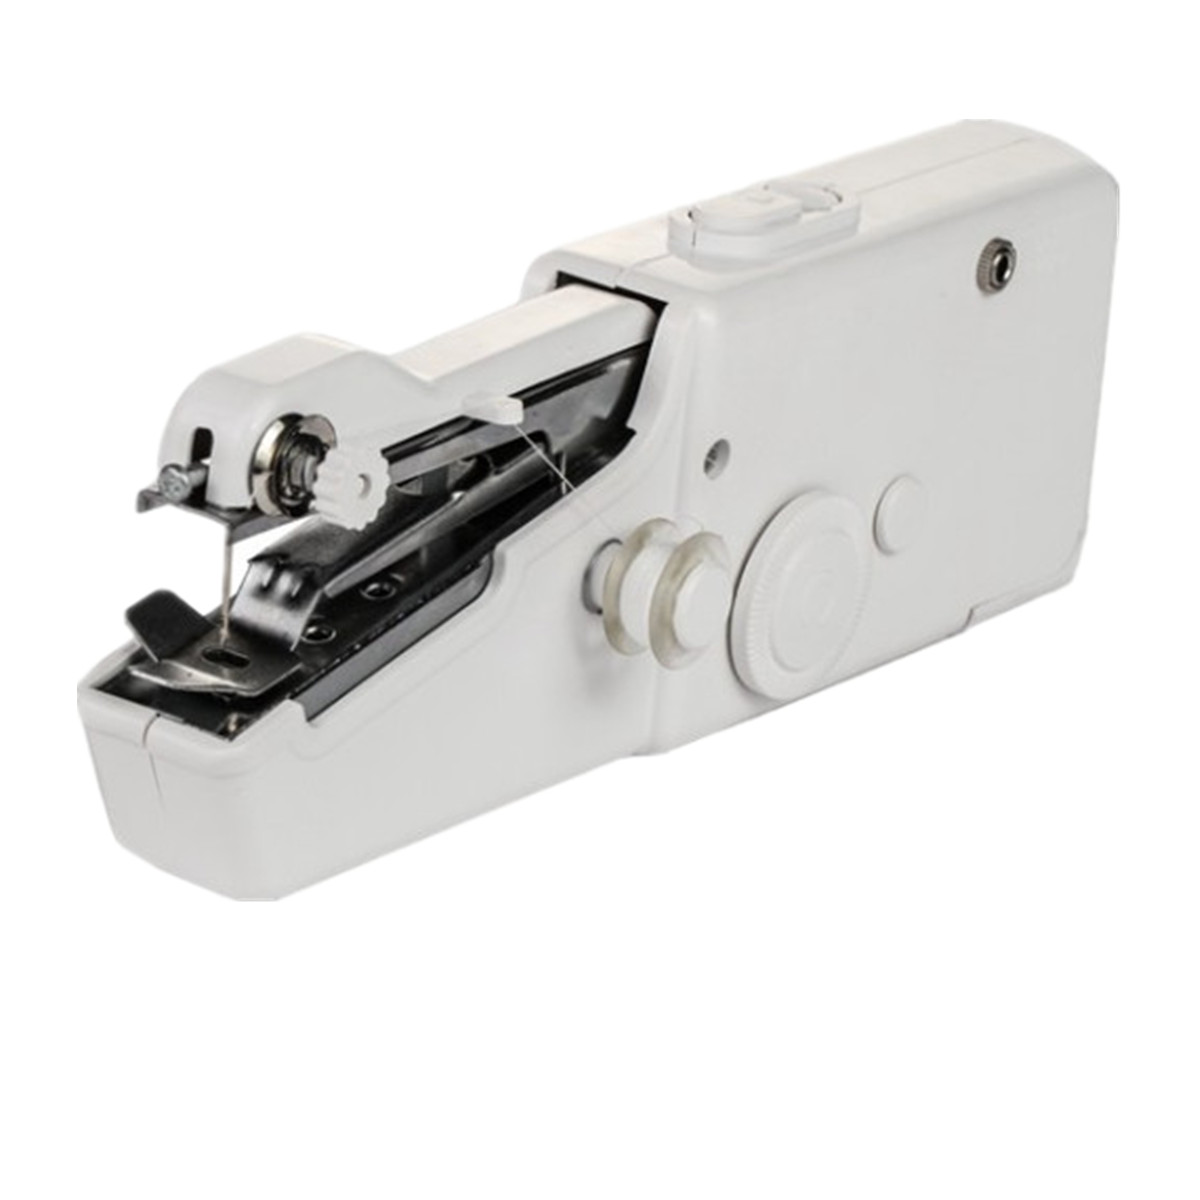 Mini stitch manuale macchina da cucire cucito cucitrice da for Macchina da cucire da viaggio